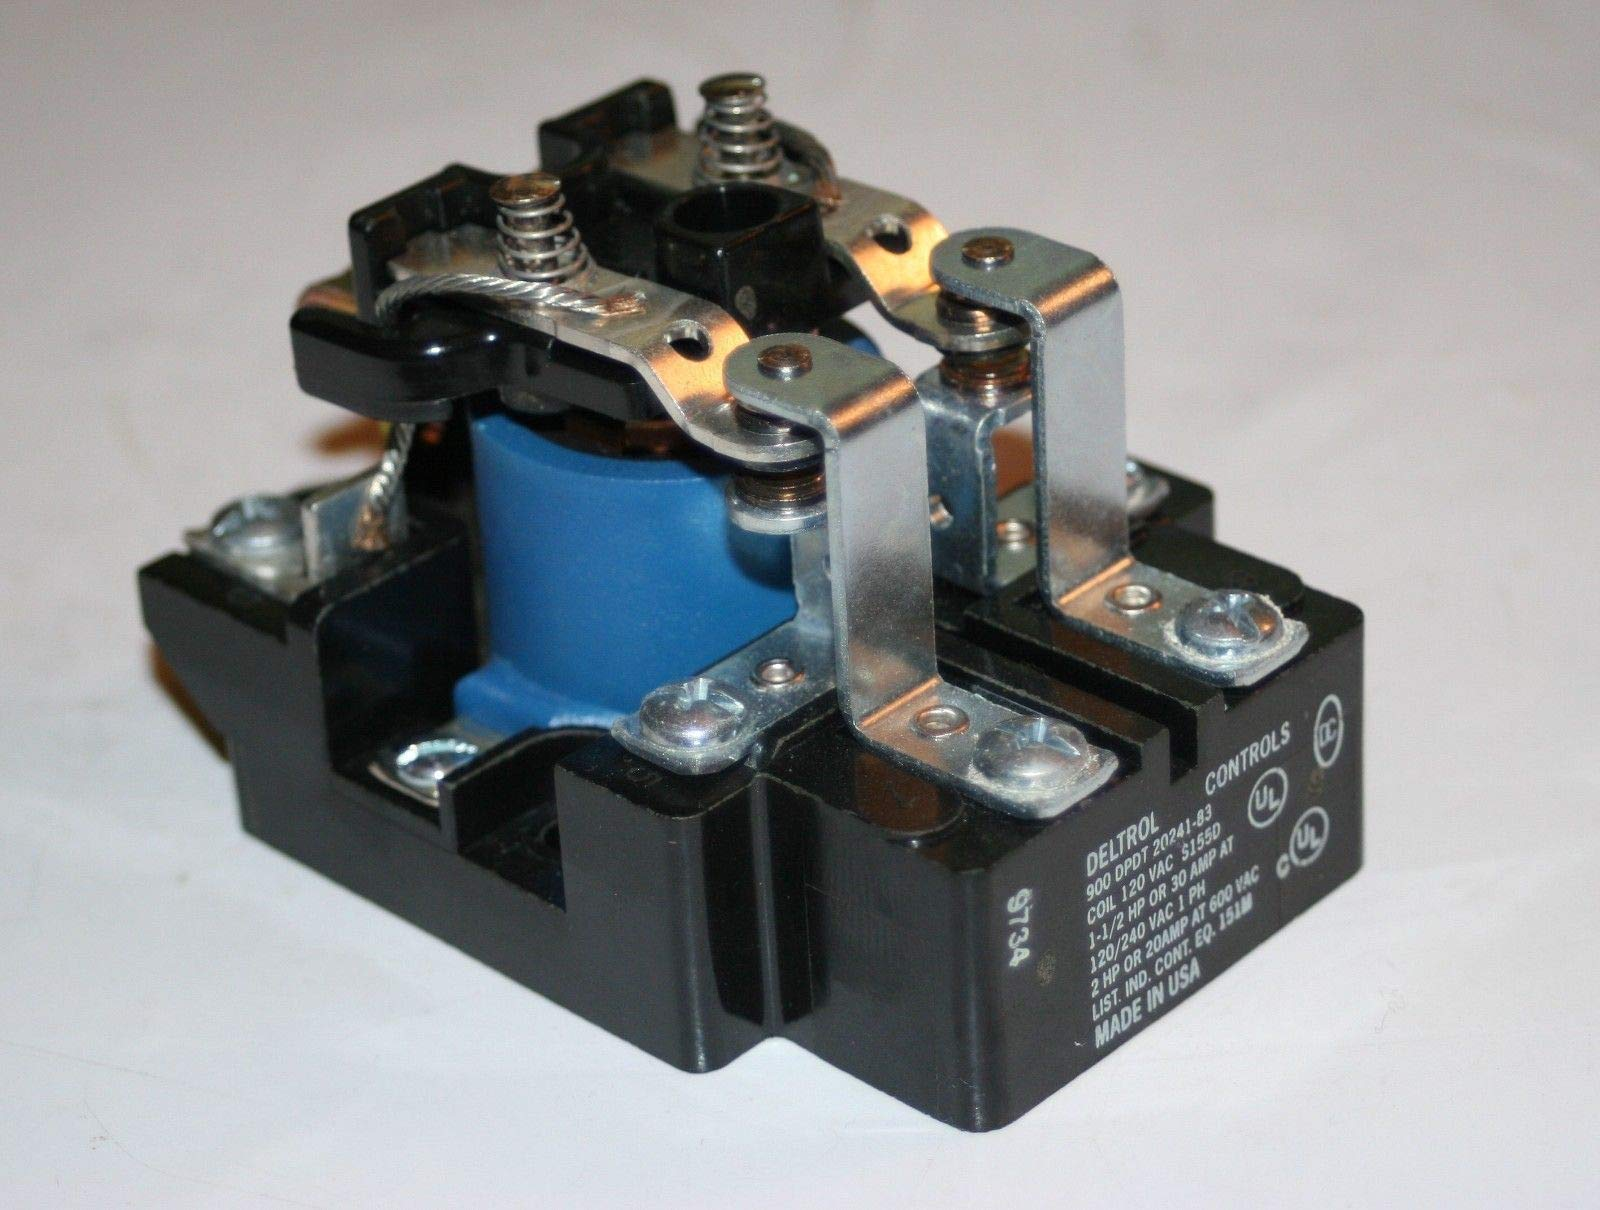 Deltrol Controls 900 DPDT 20241-83 Electromechanical Power Relay 120VAC 30A